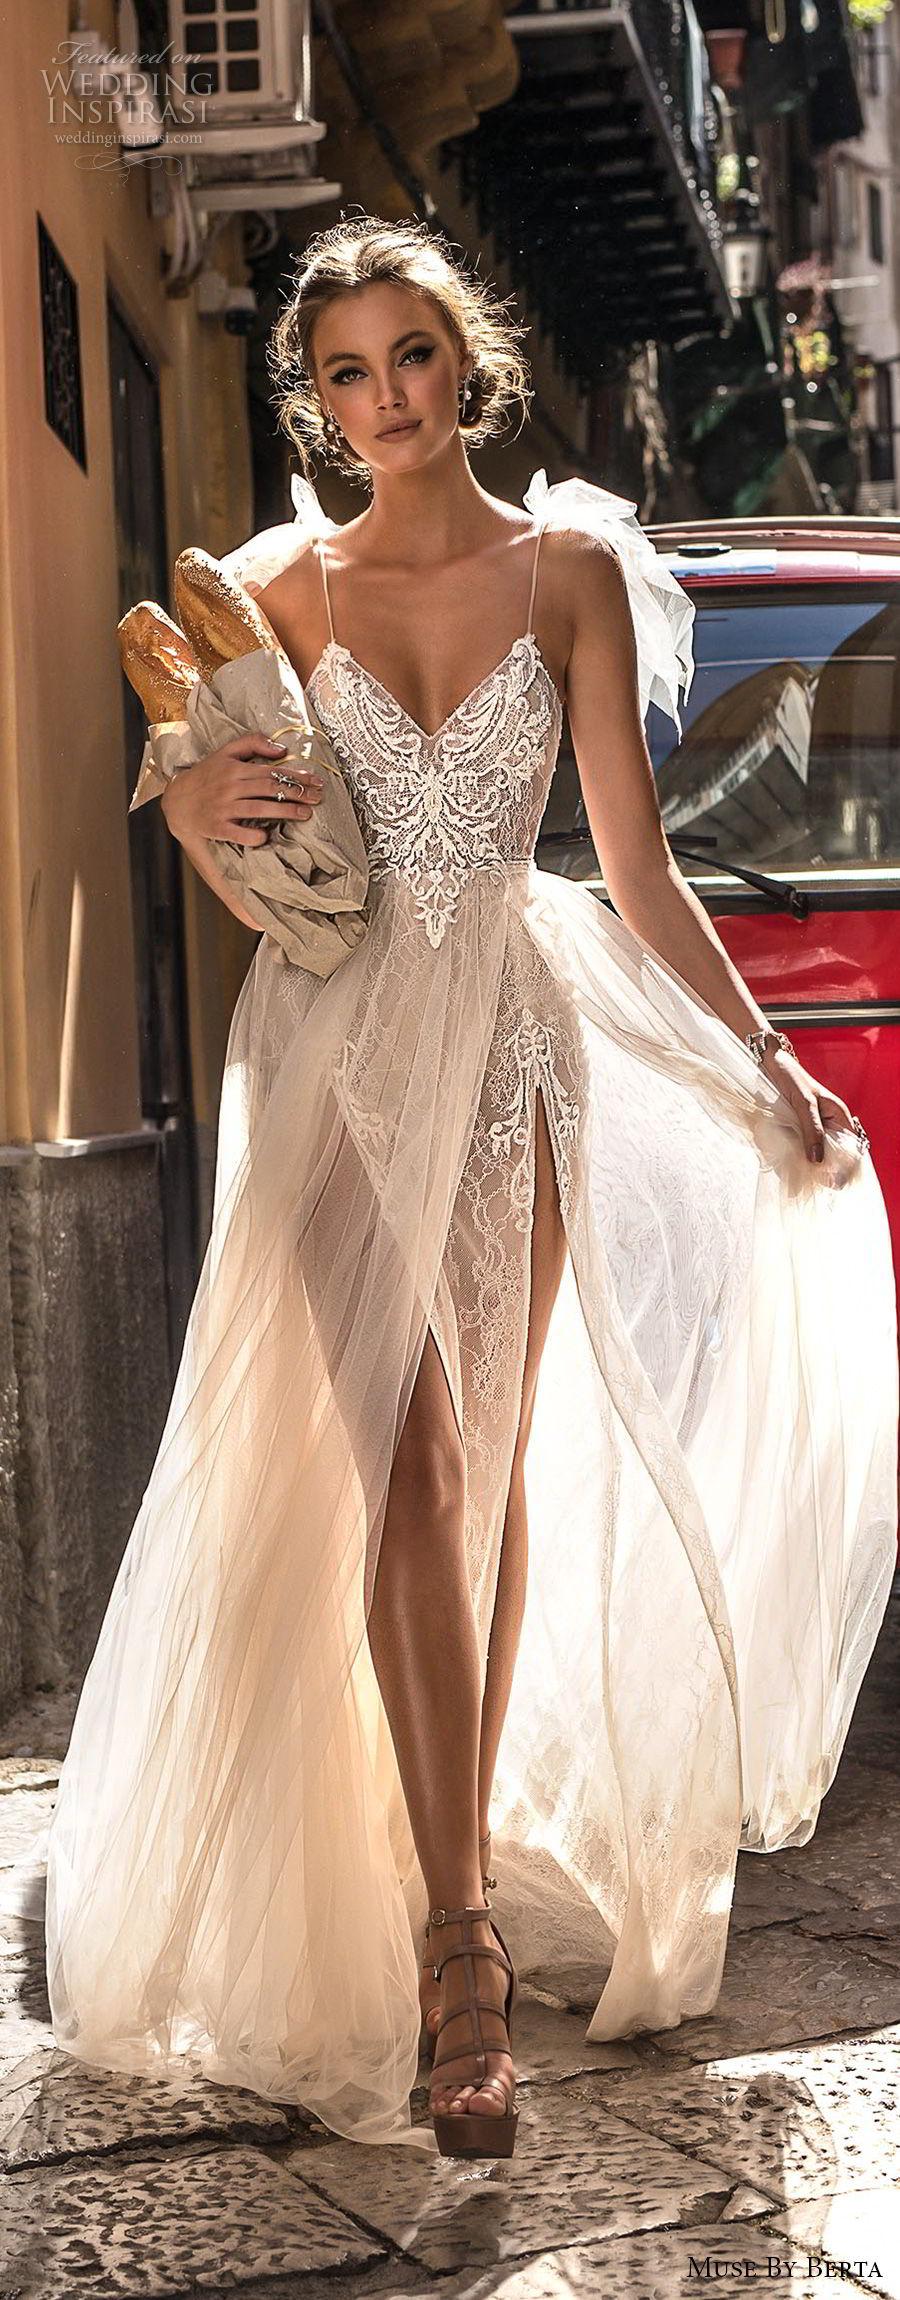 muse-berta-2018-bridal-spaghetti-strap-sweetheart-neckline-heavily-embellished-bodice-high-slit-tulle-skirt-sexy-soft-a-line-wedding-dress-sweep-train-1-lv